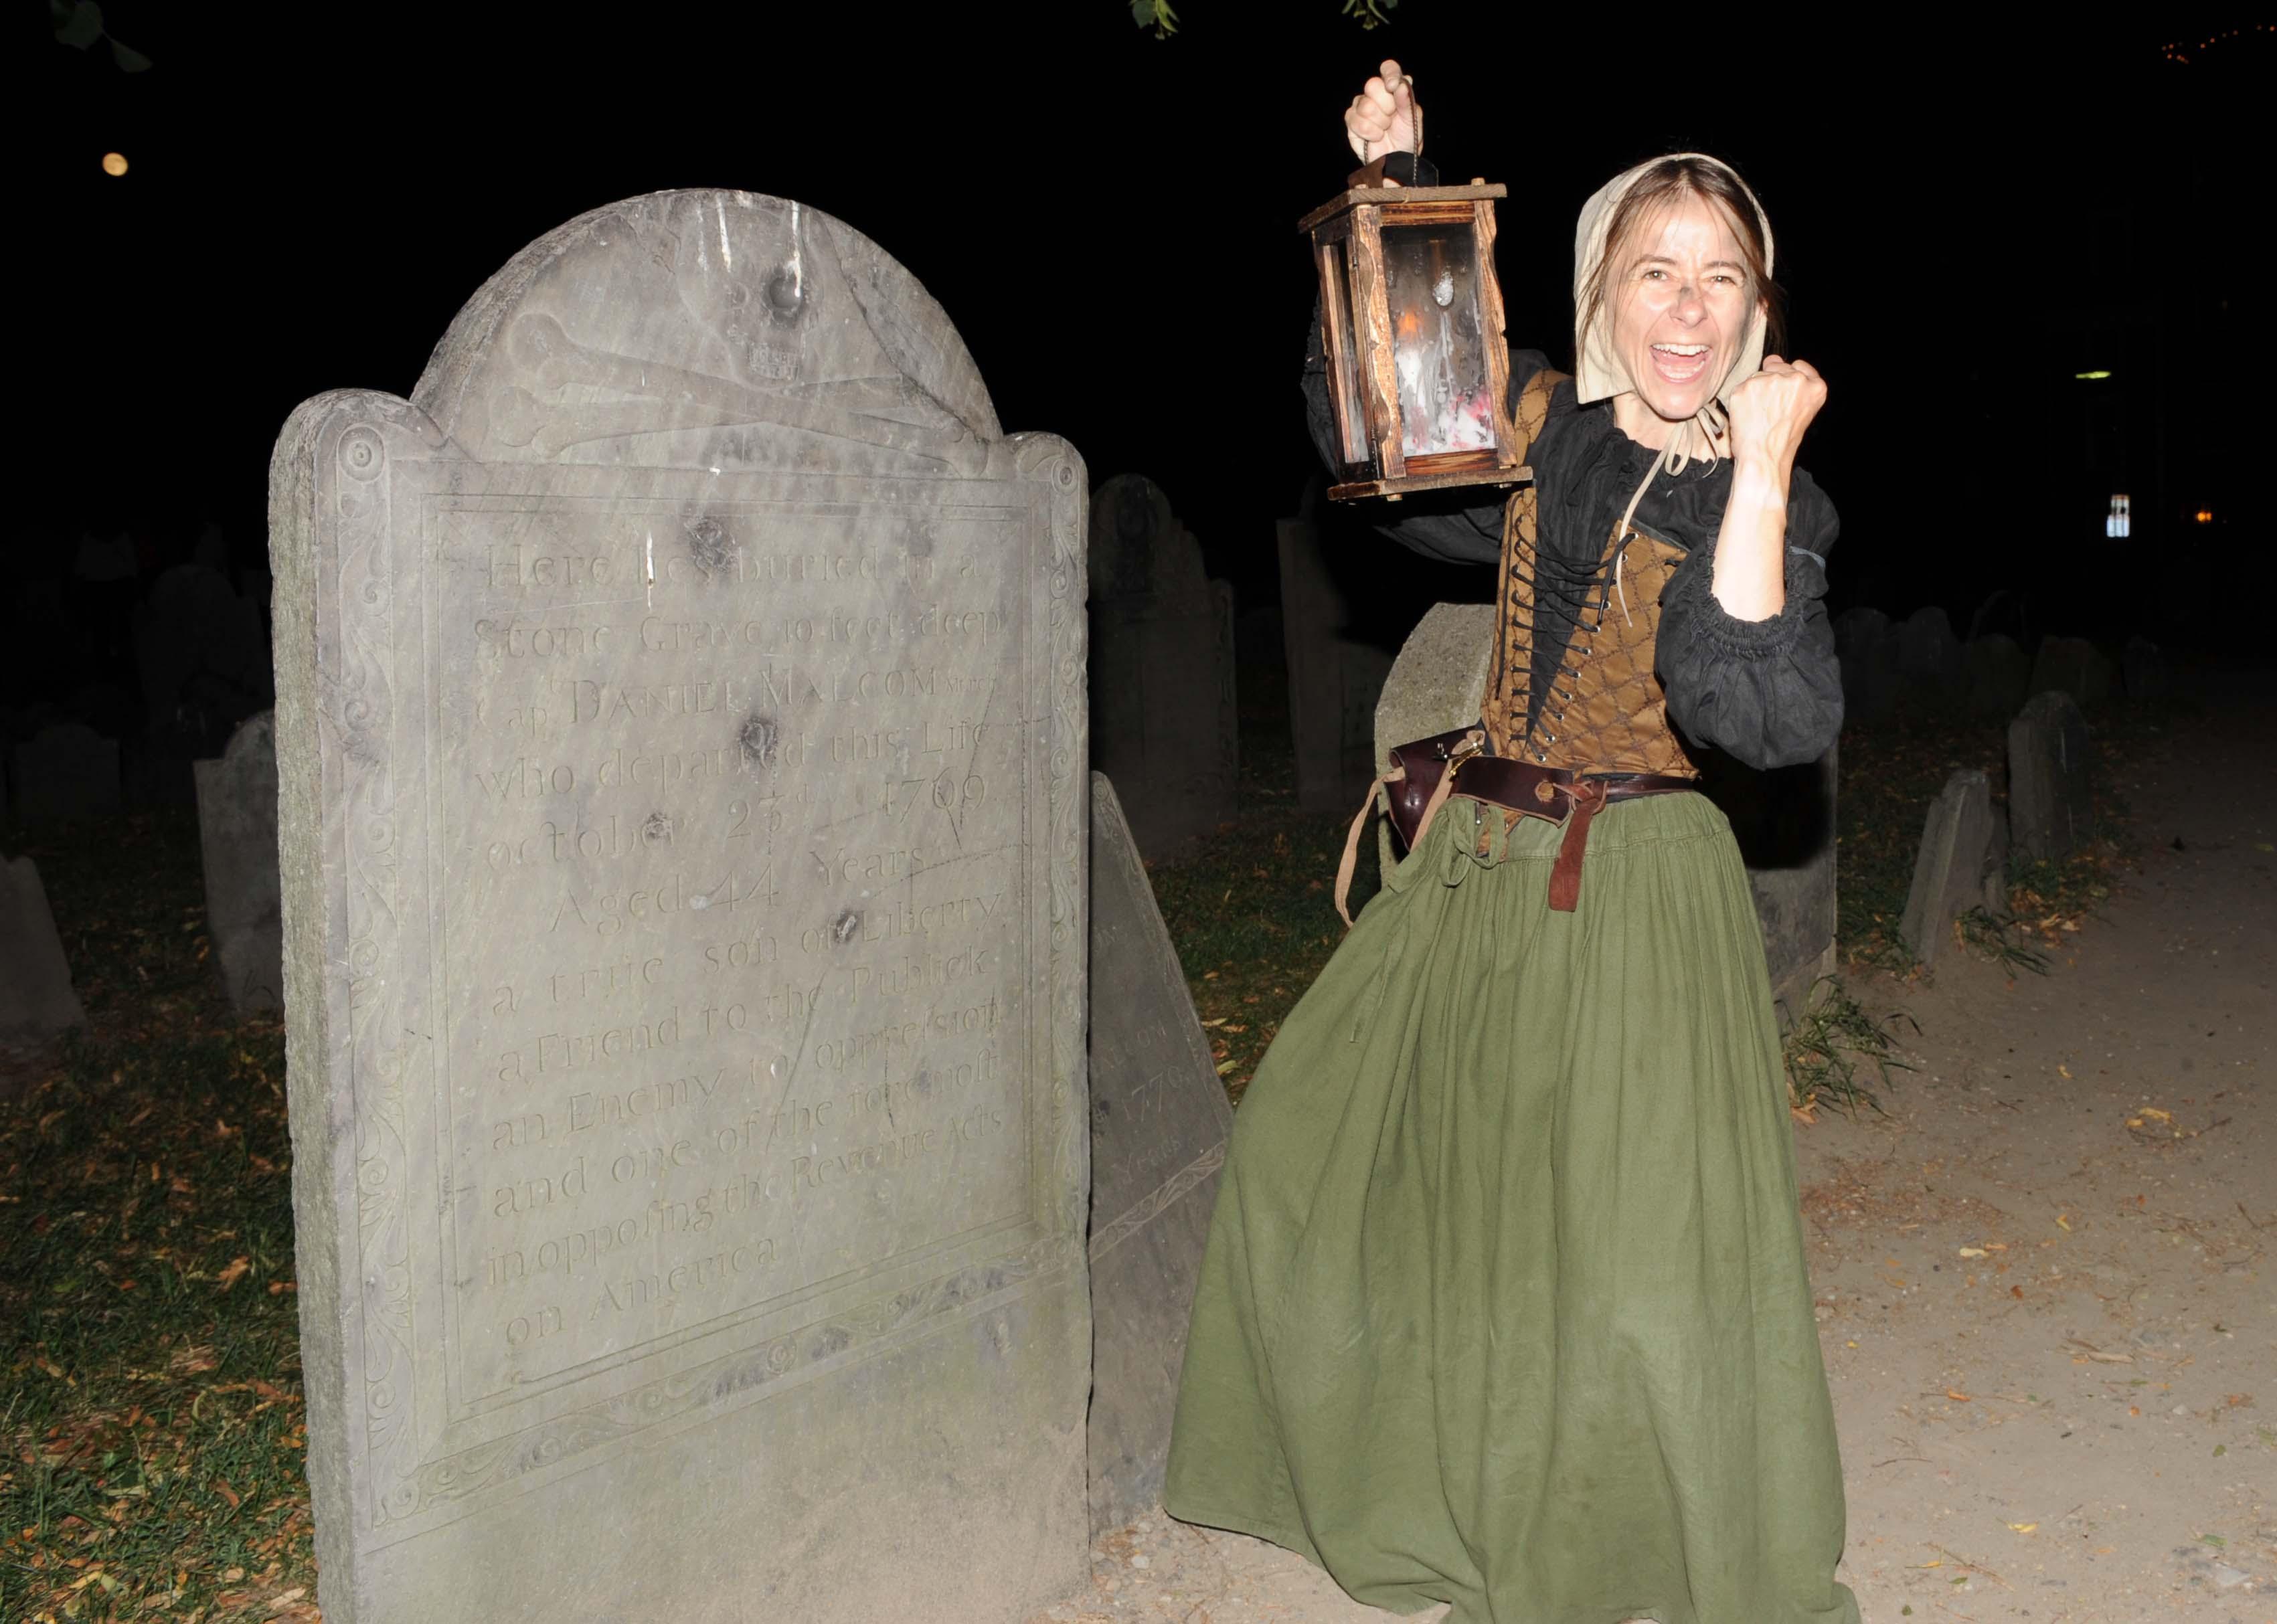 Ghosts and Gravestones - St Augustine FL